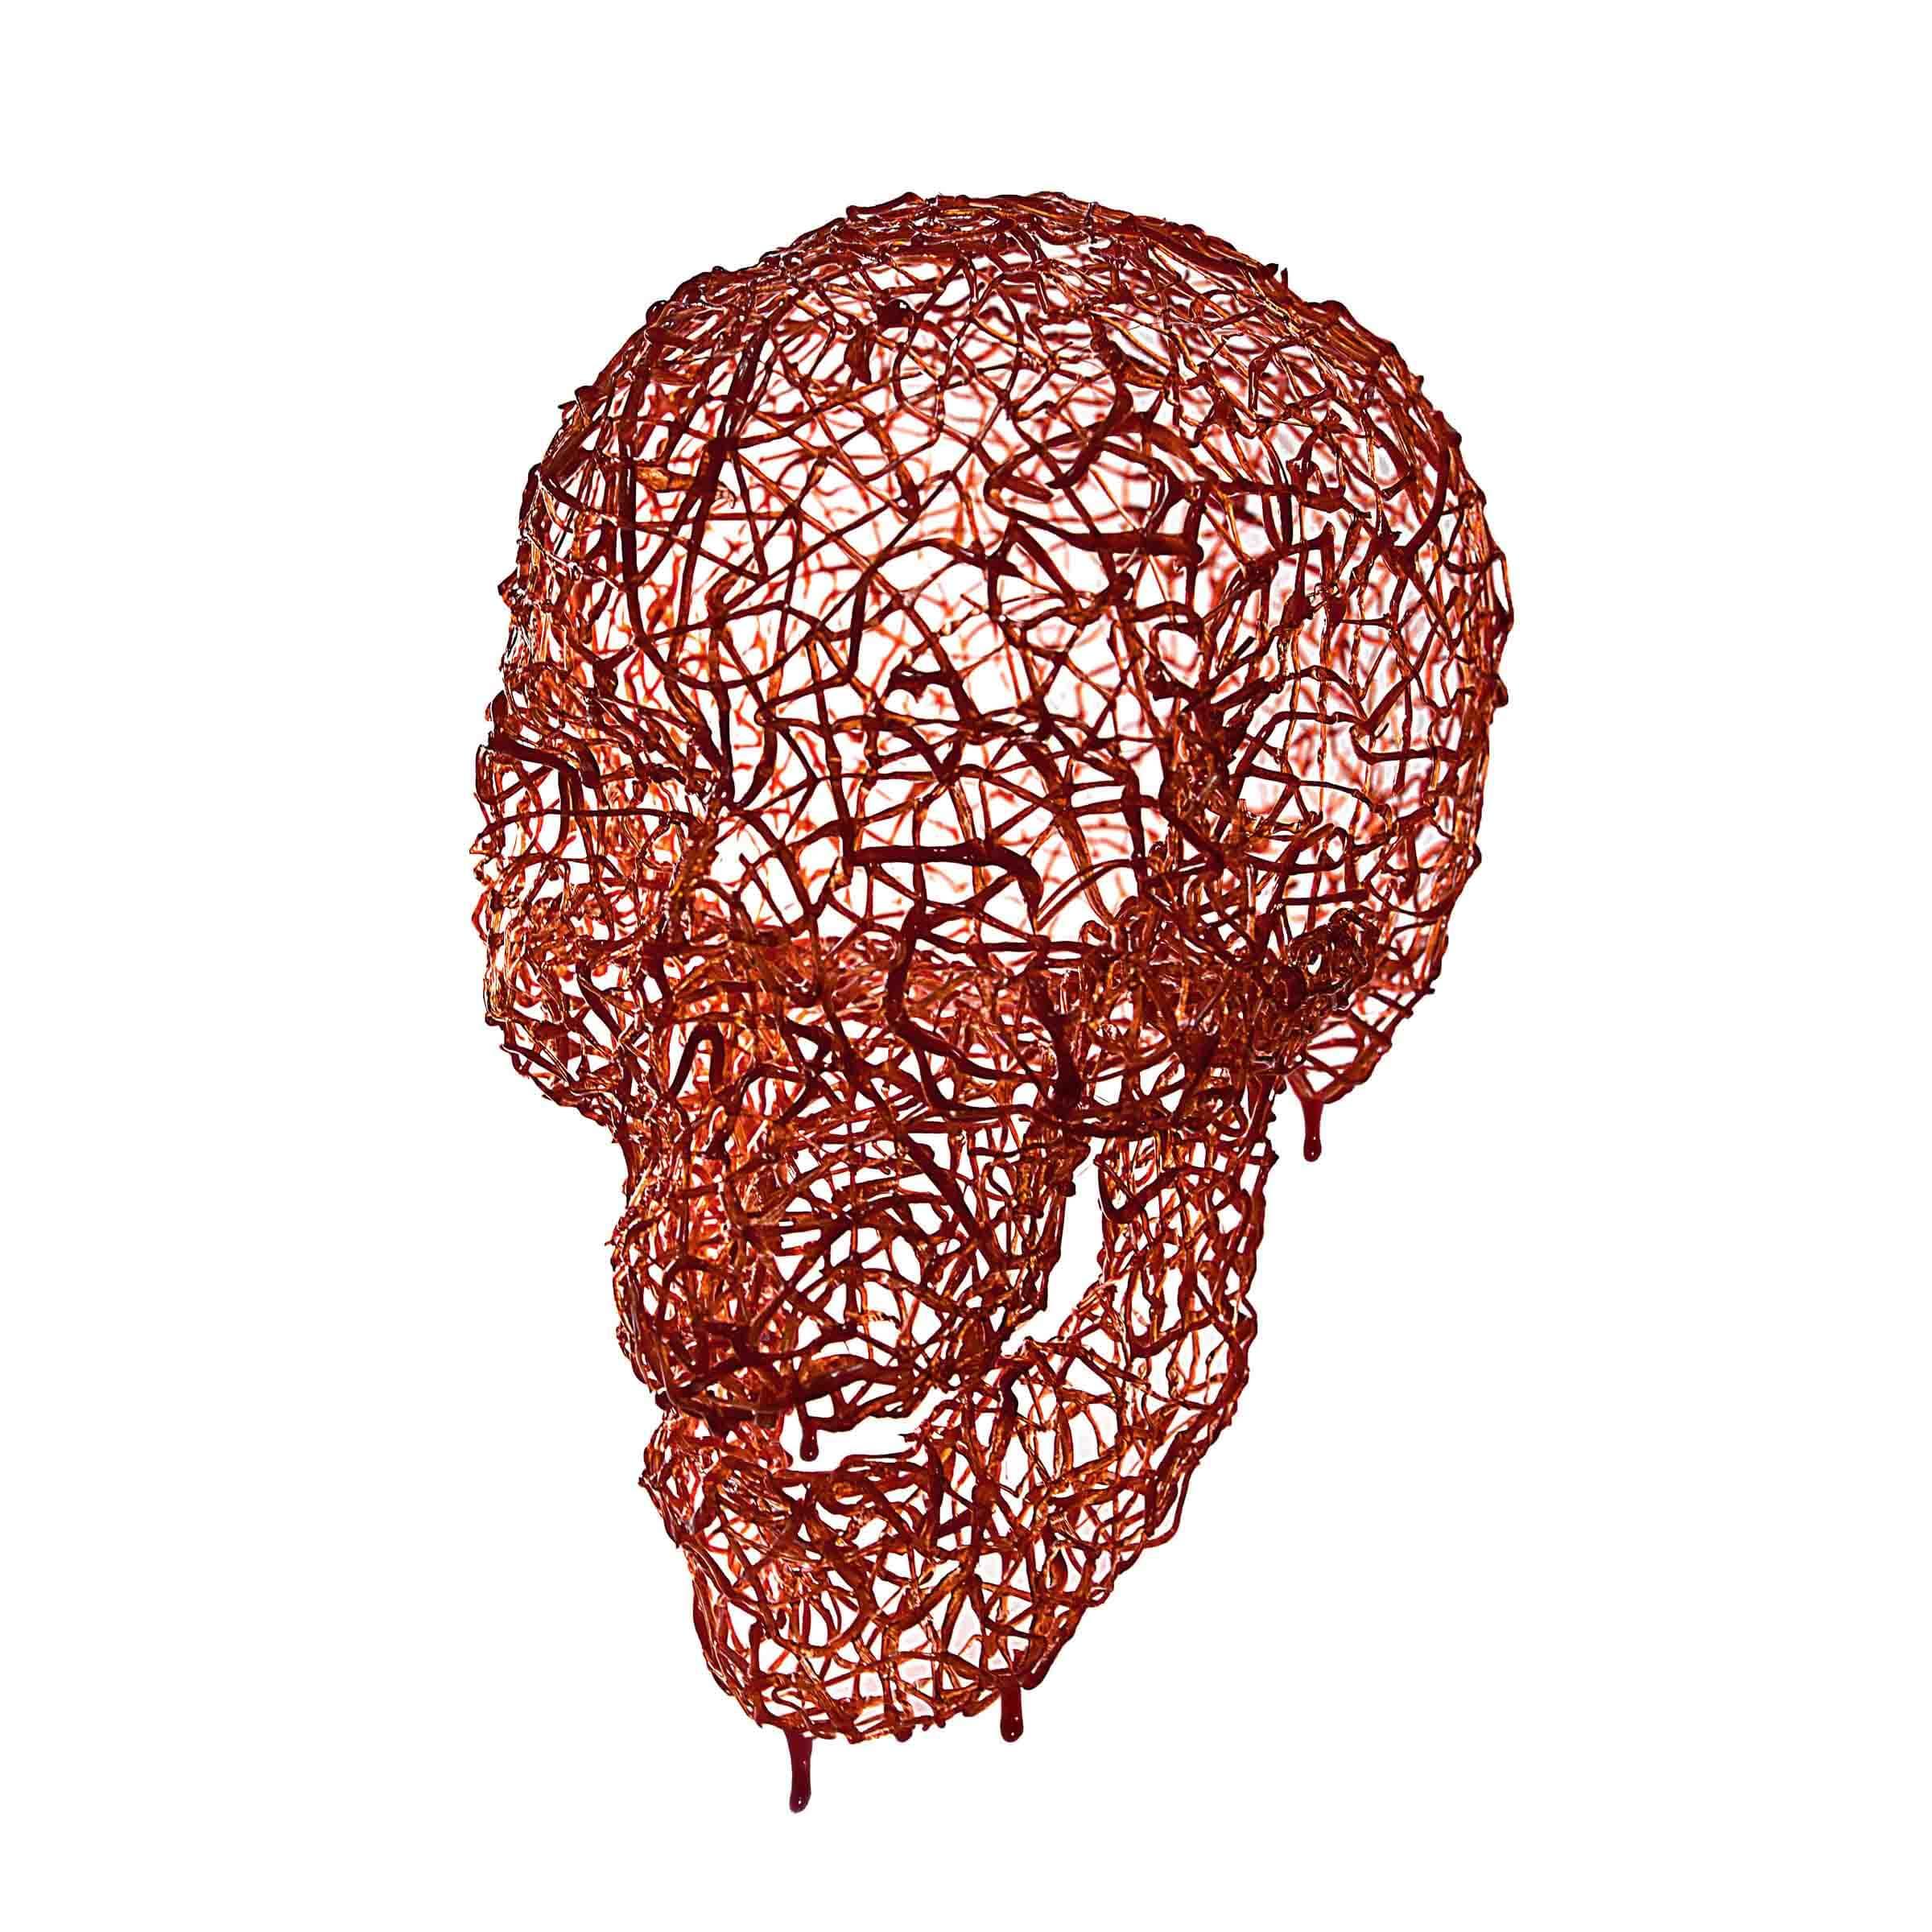 adrenochrome skull by Leo Haz